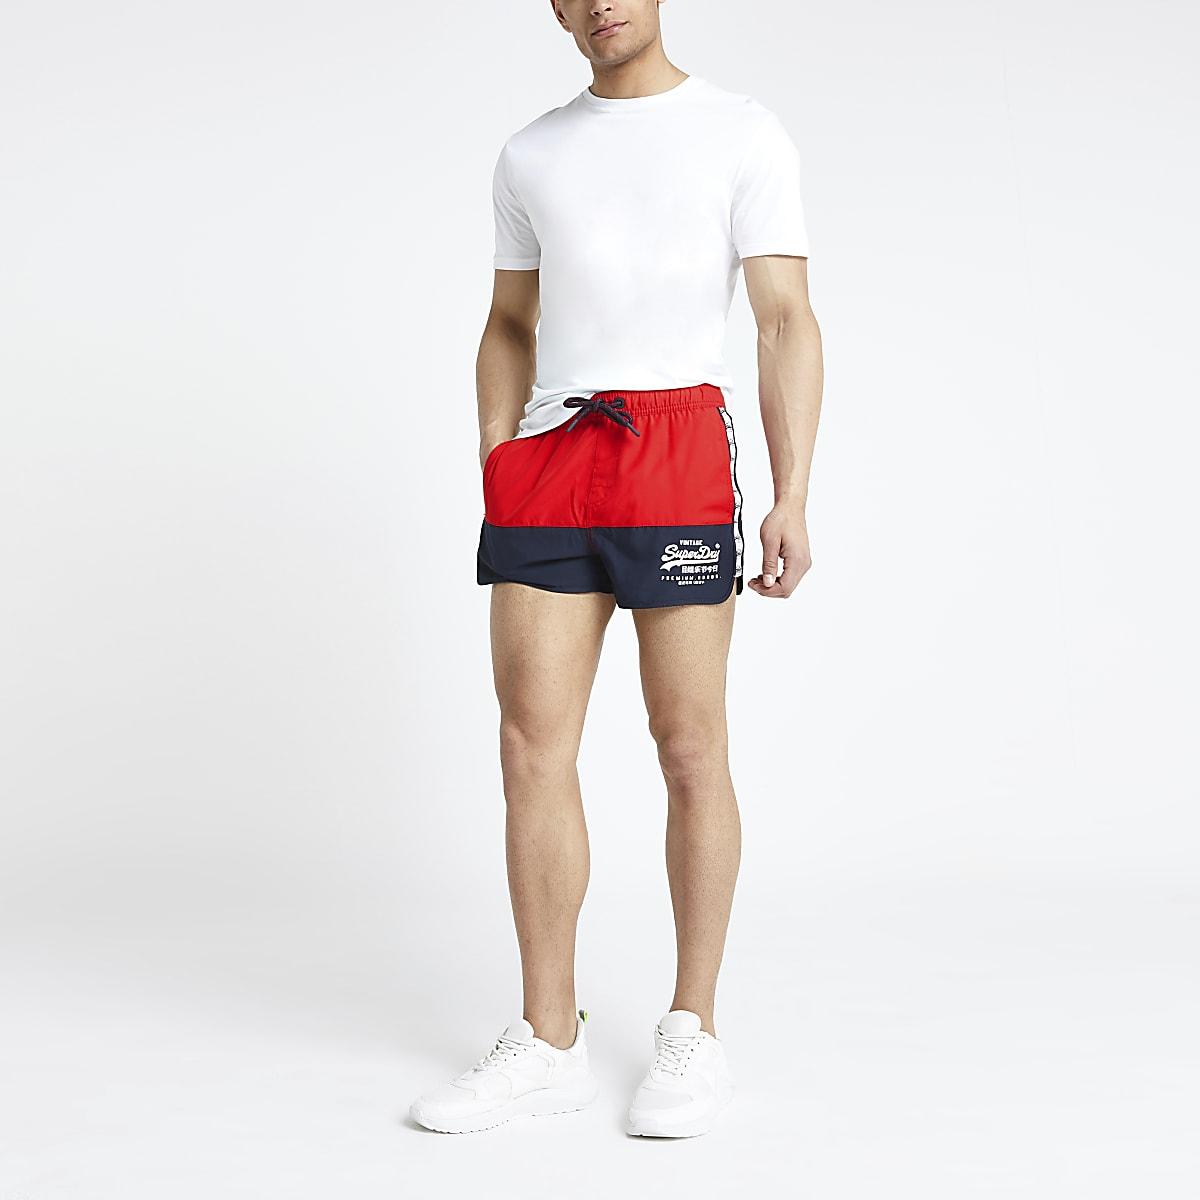 a81b866995 Superdry red runner swim shorts - Swim Shorts - Shorts - men